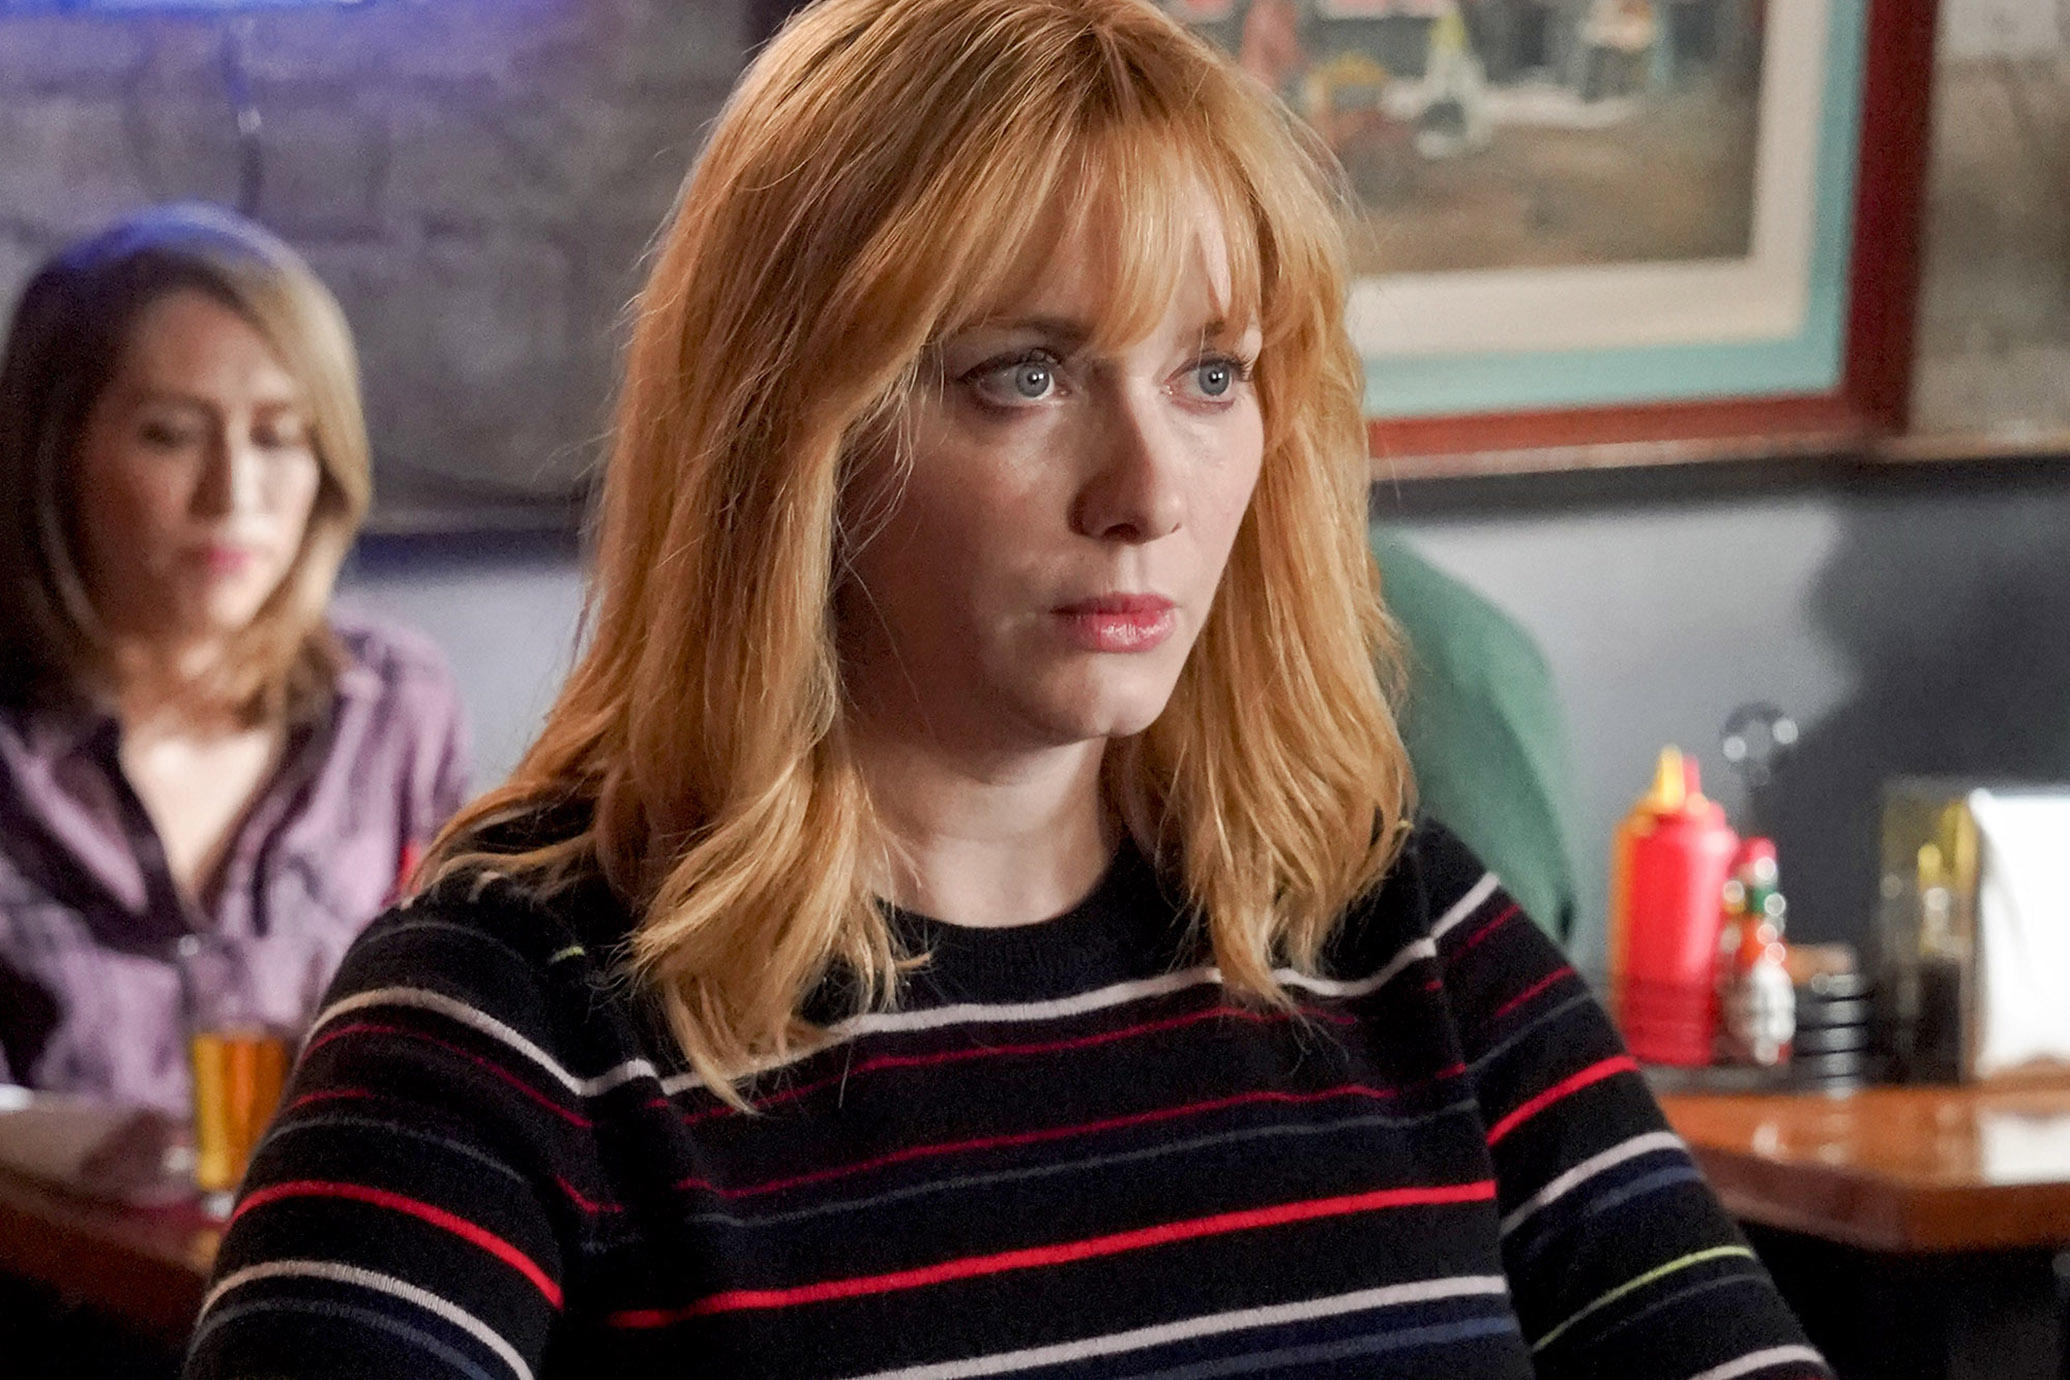 Christina Hendricks, Beth Boland, in season 2.